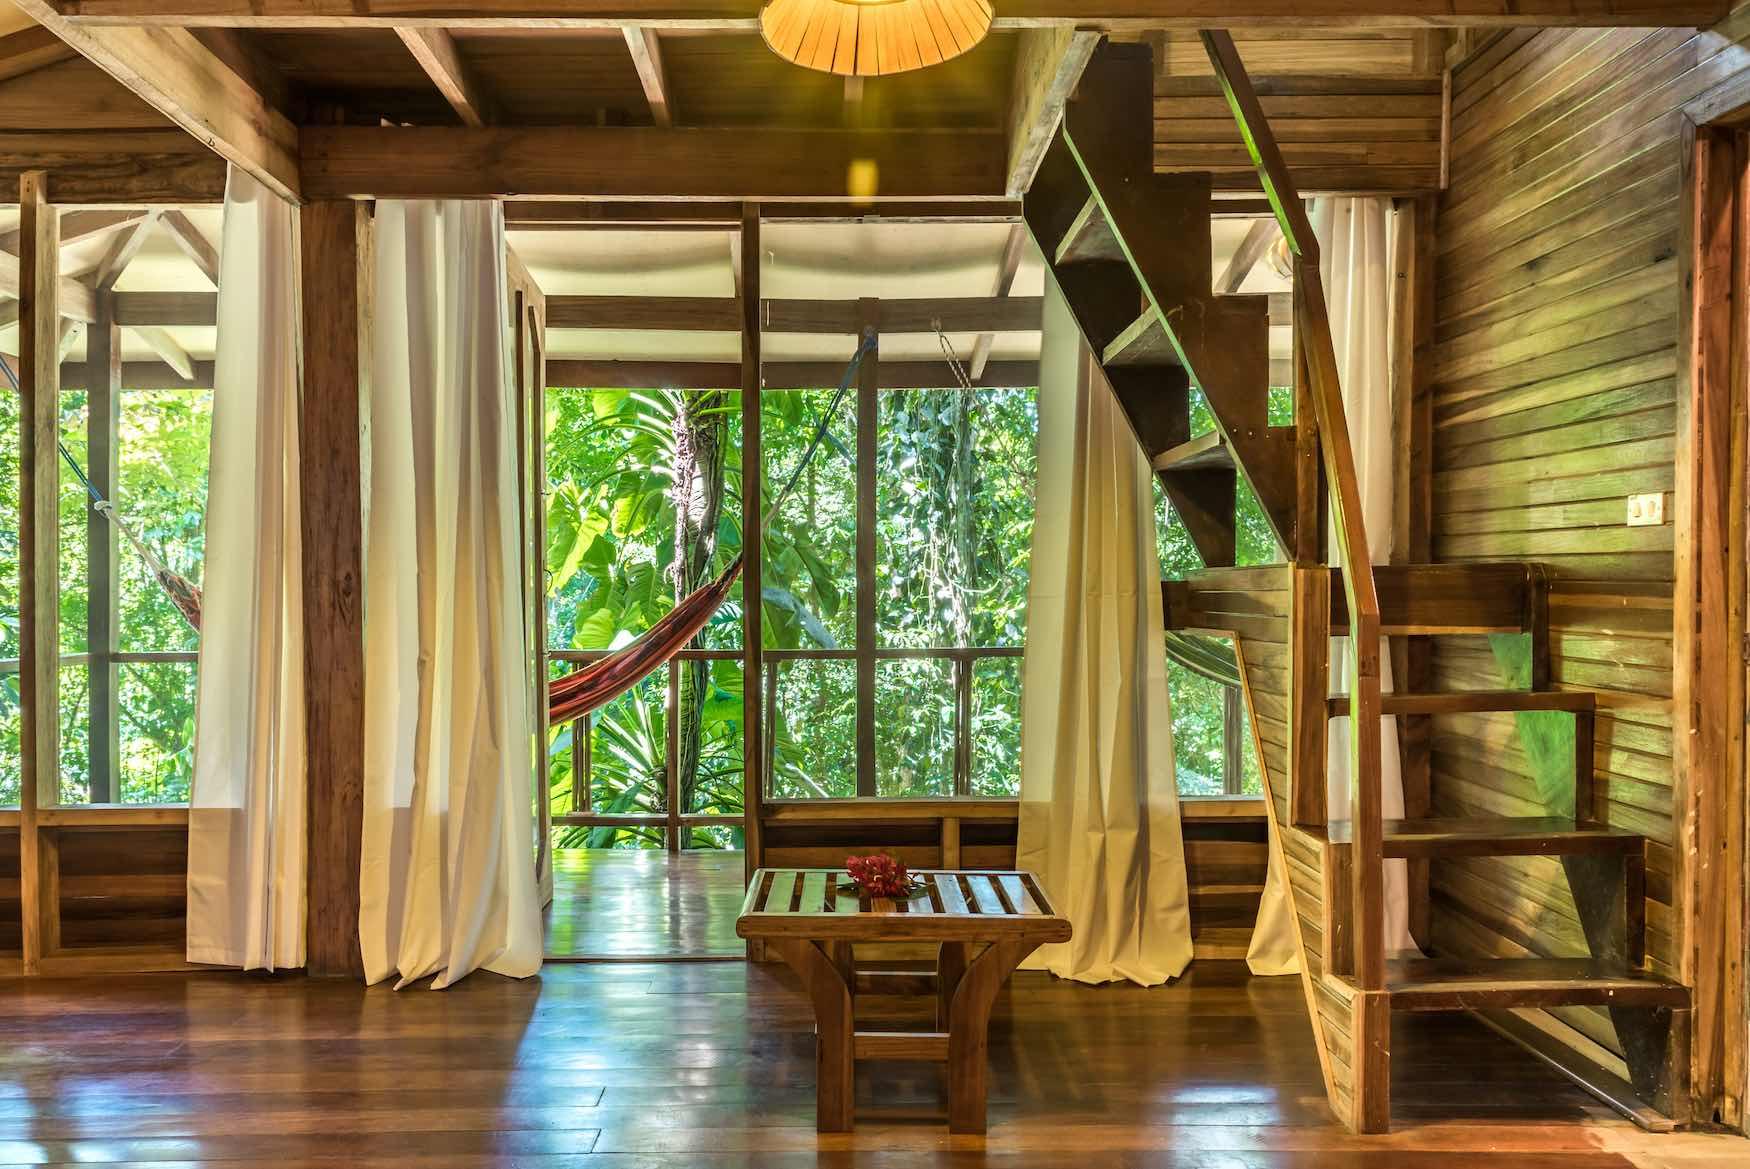 Samasati Yoga and Wellness Retreat Costa Rica